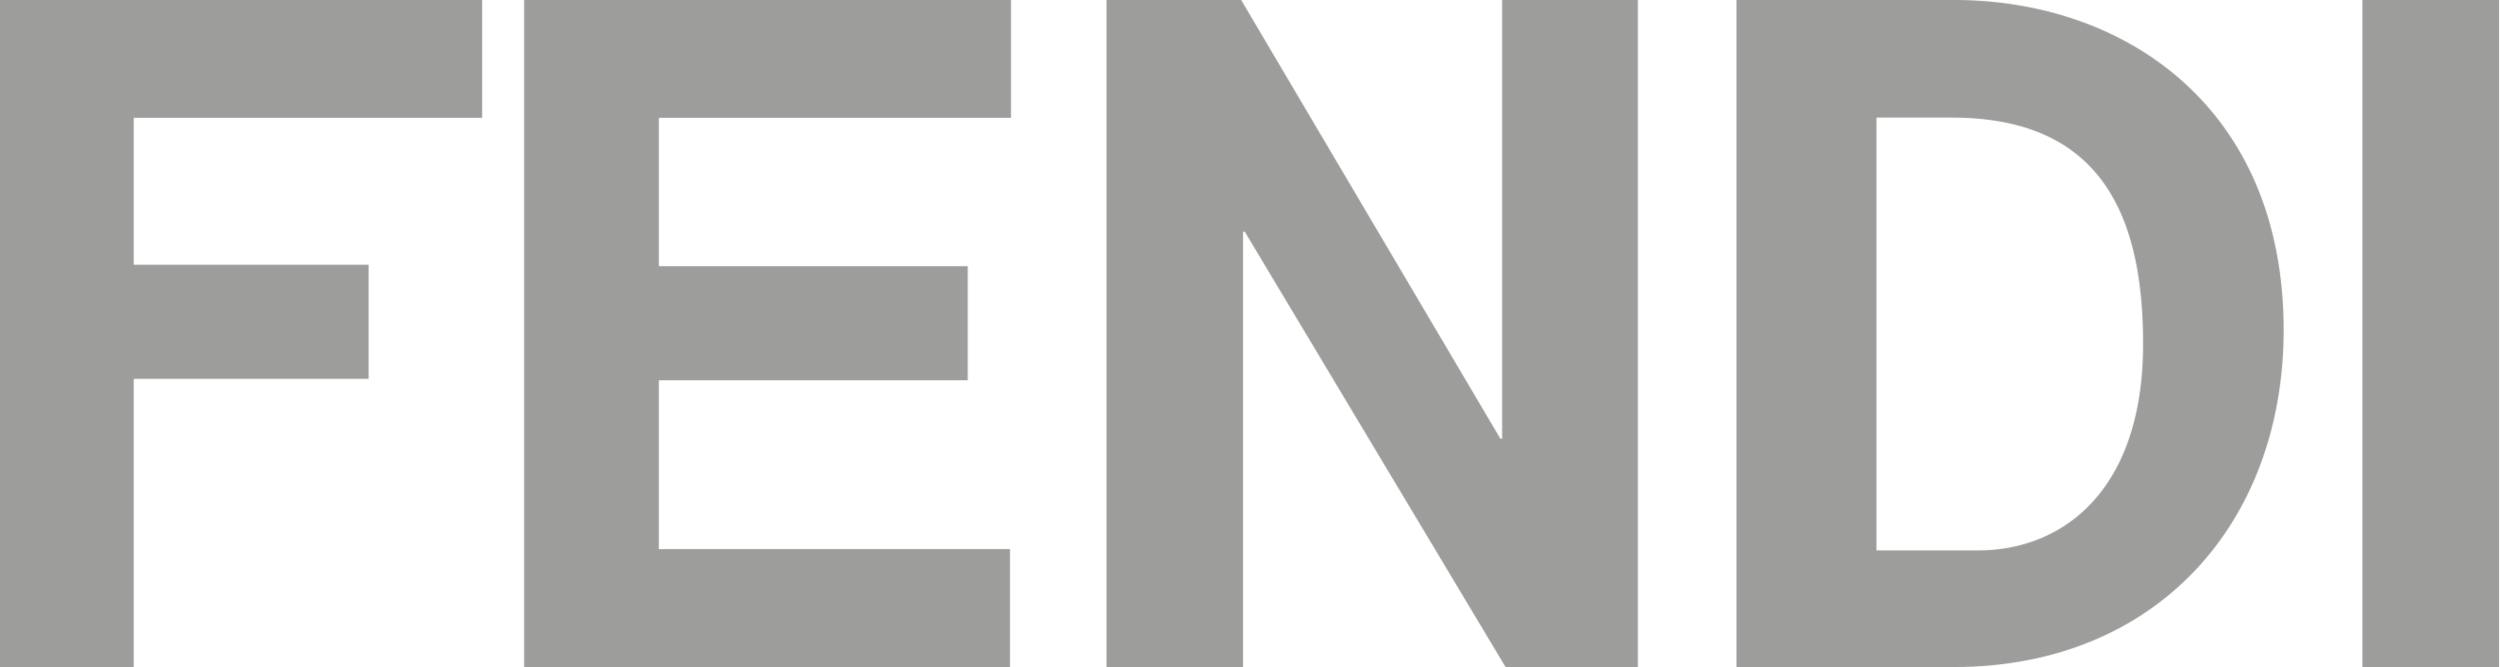 Copy of Fendi